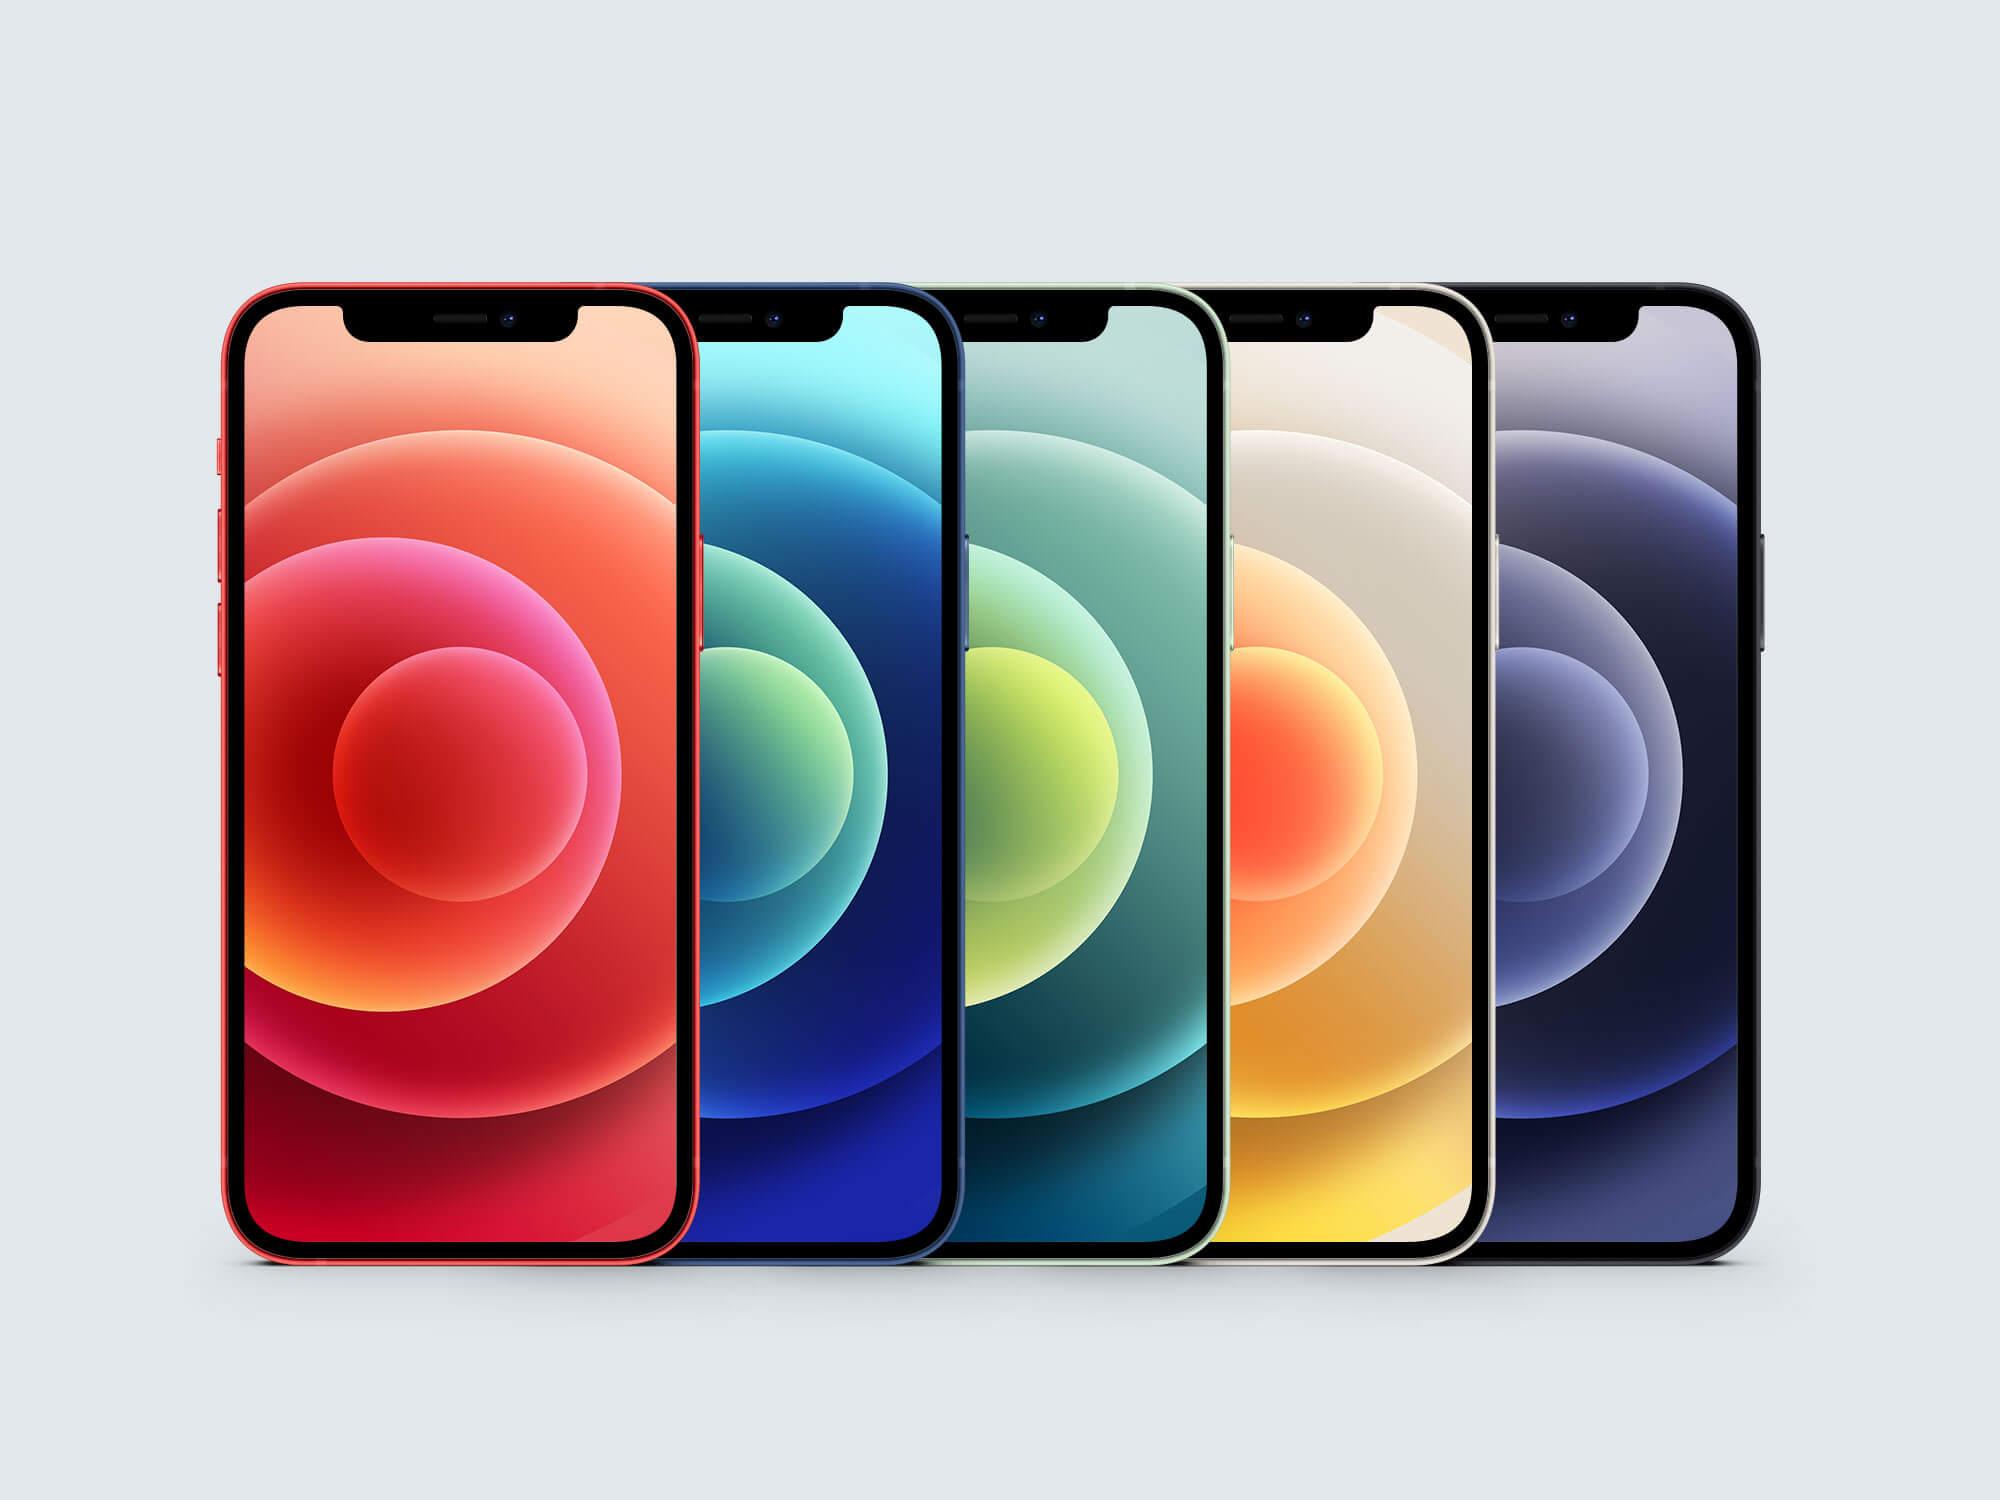 Free-Apple-iPhone-12-Mini-Mockup-PSD-(All-Colors)